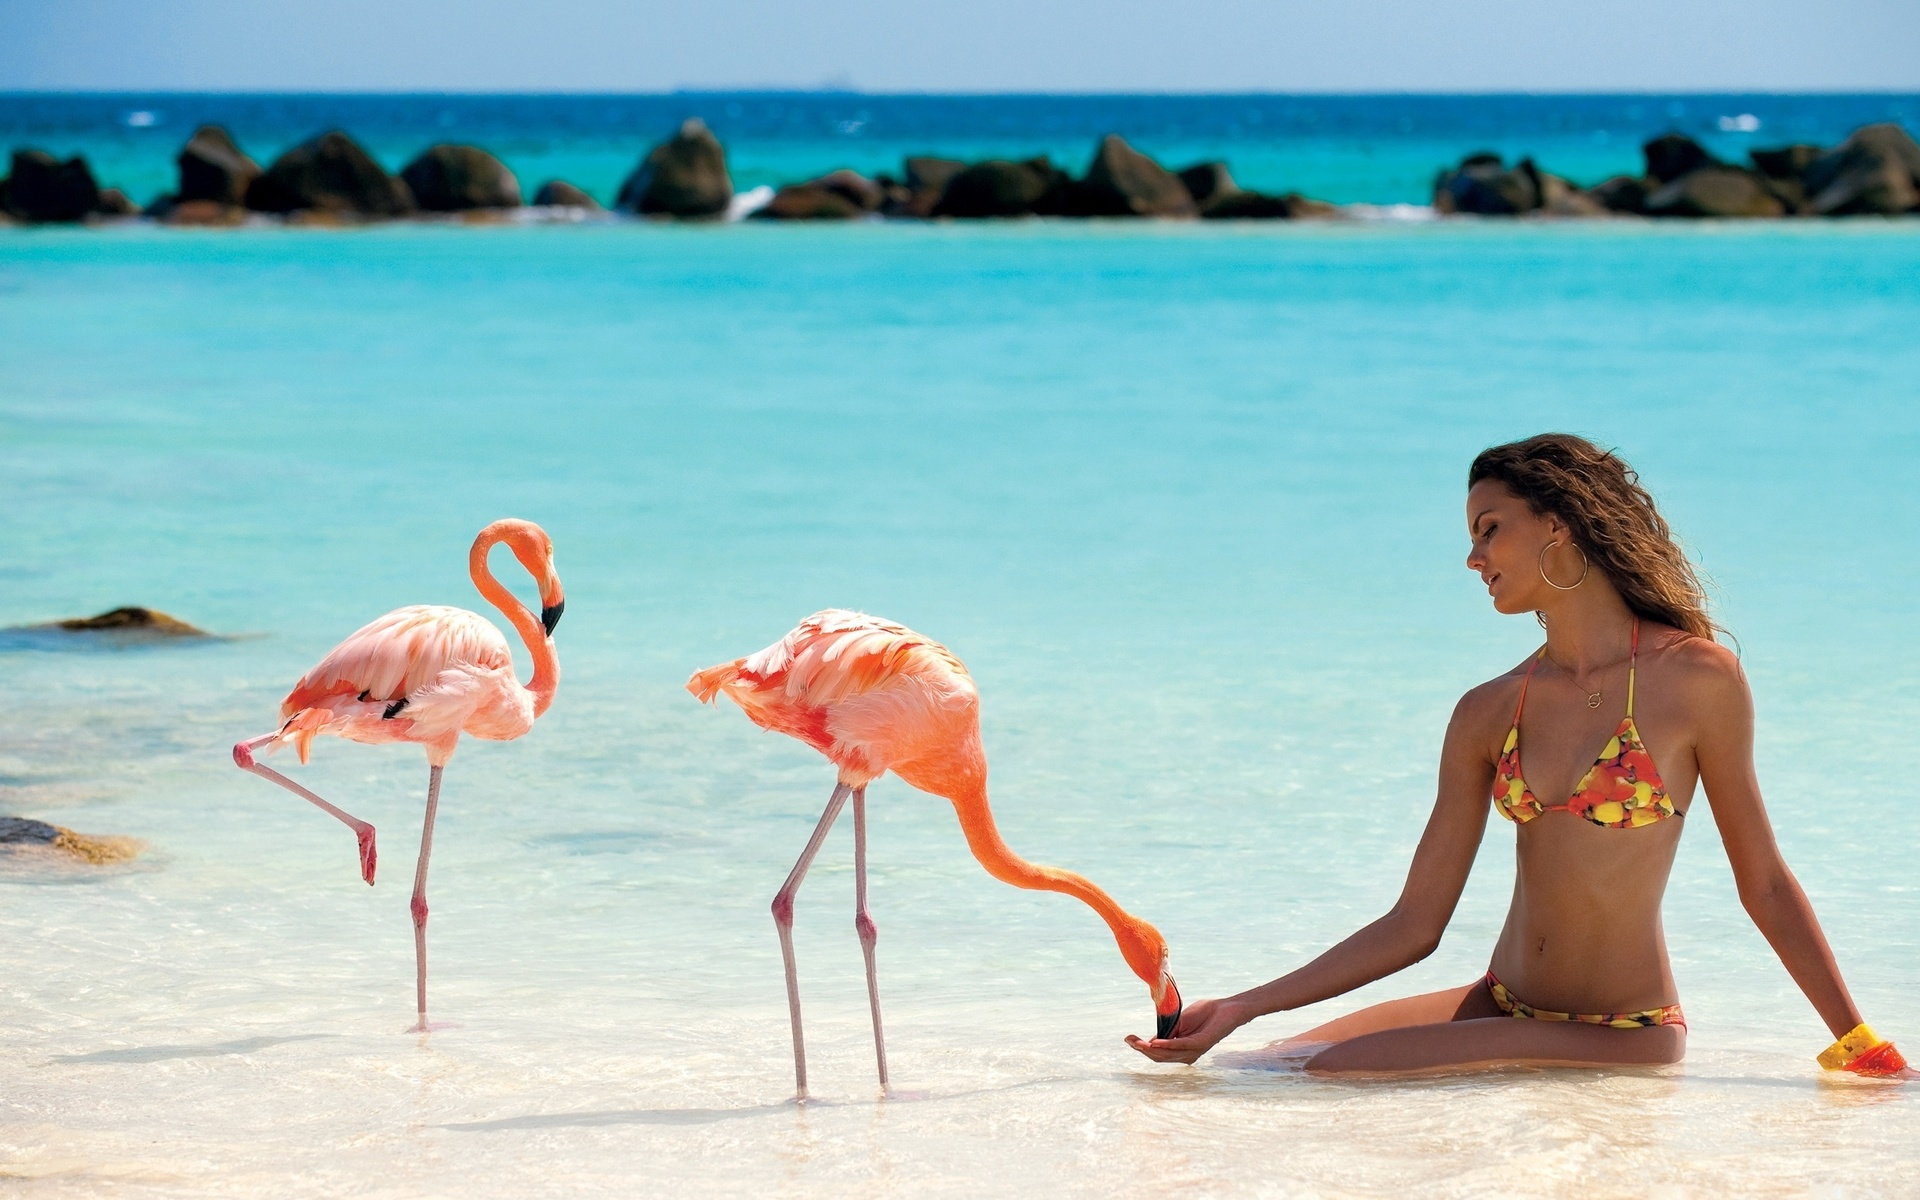 фламинго картинки и человек минкульте